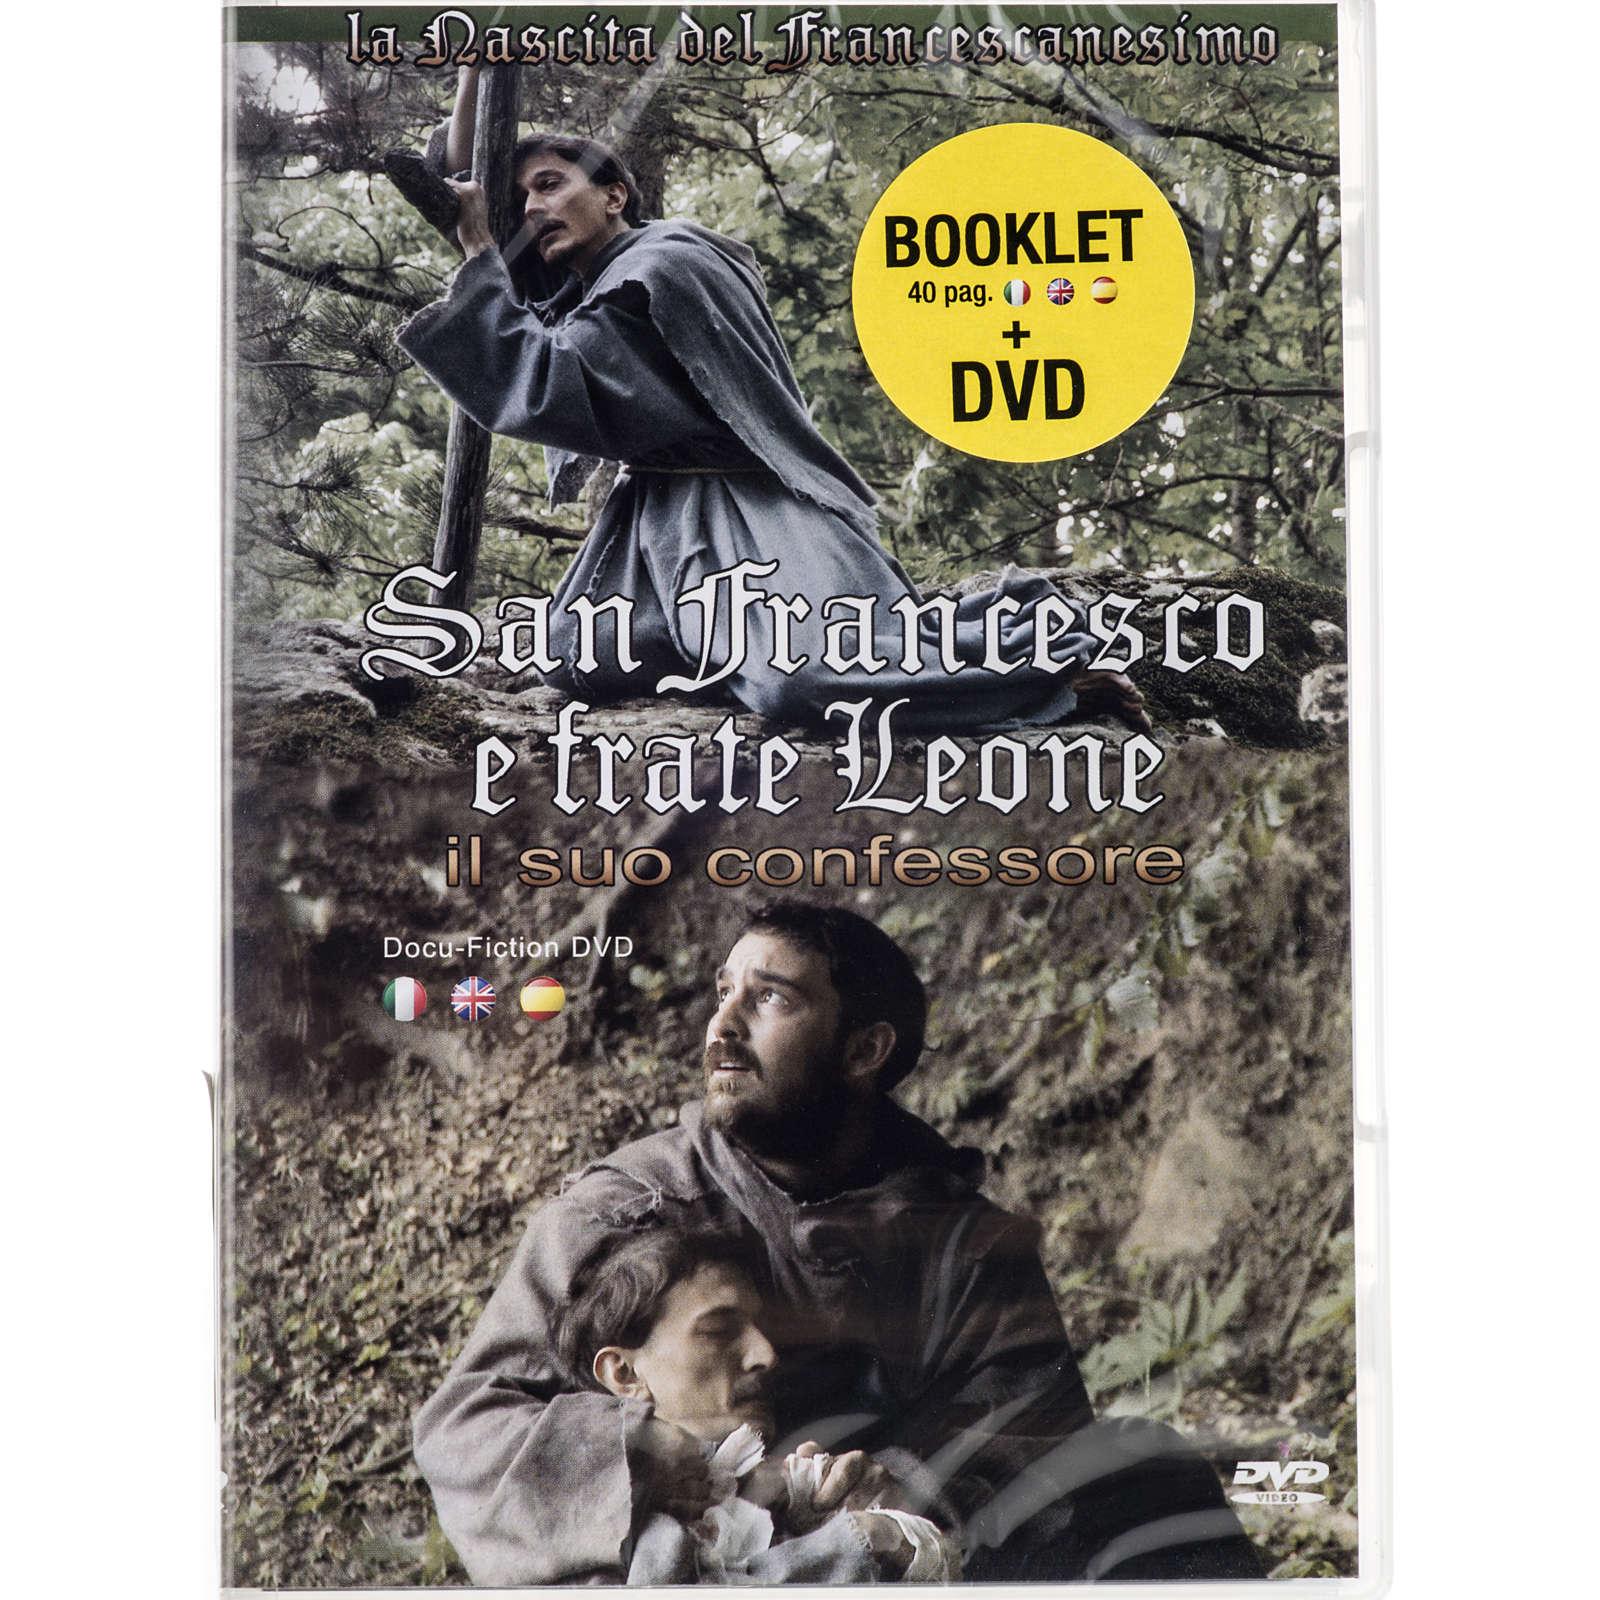 Saint Francis and friar Leo his confessor 3